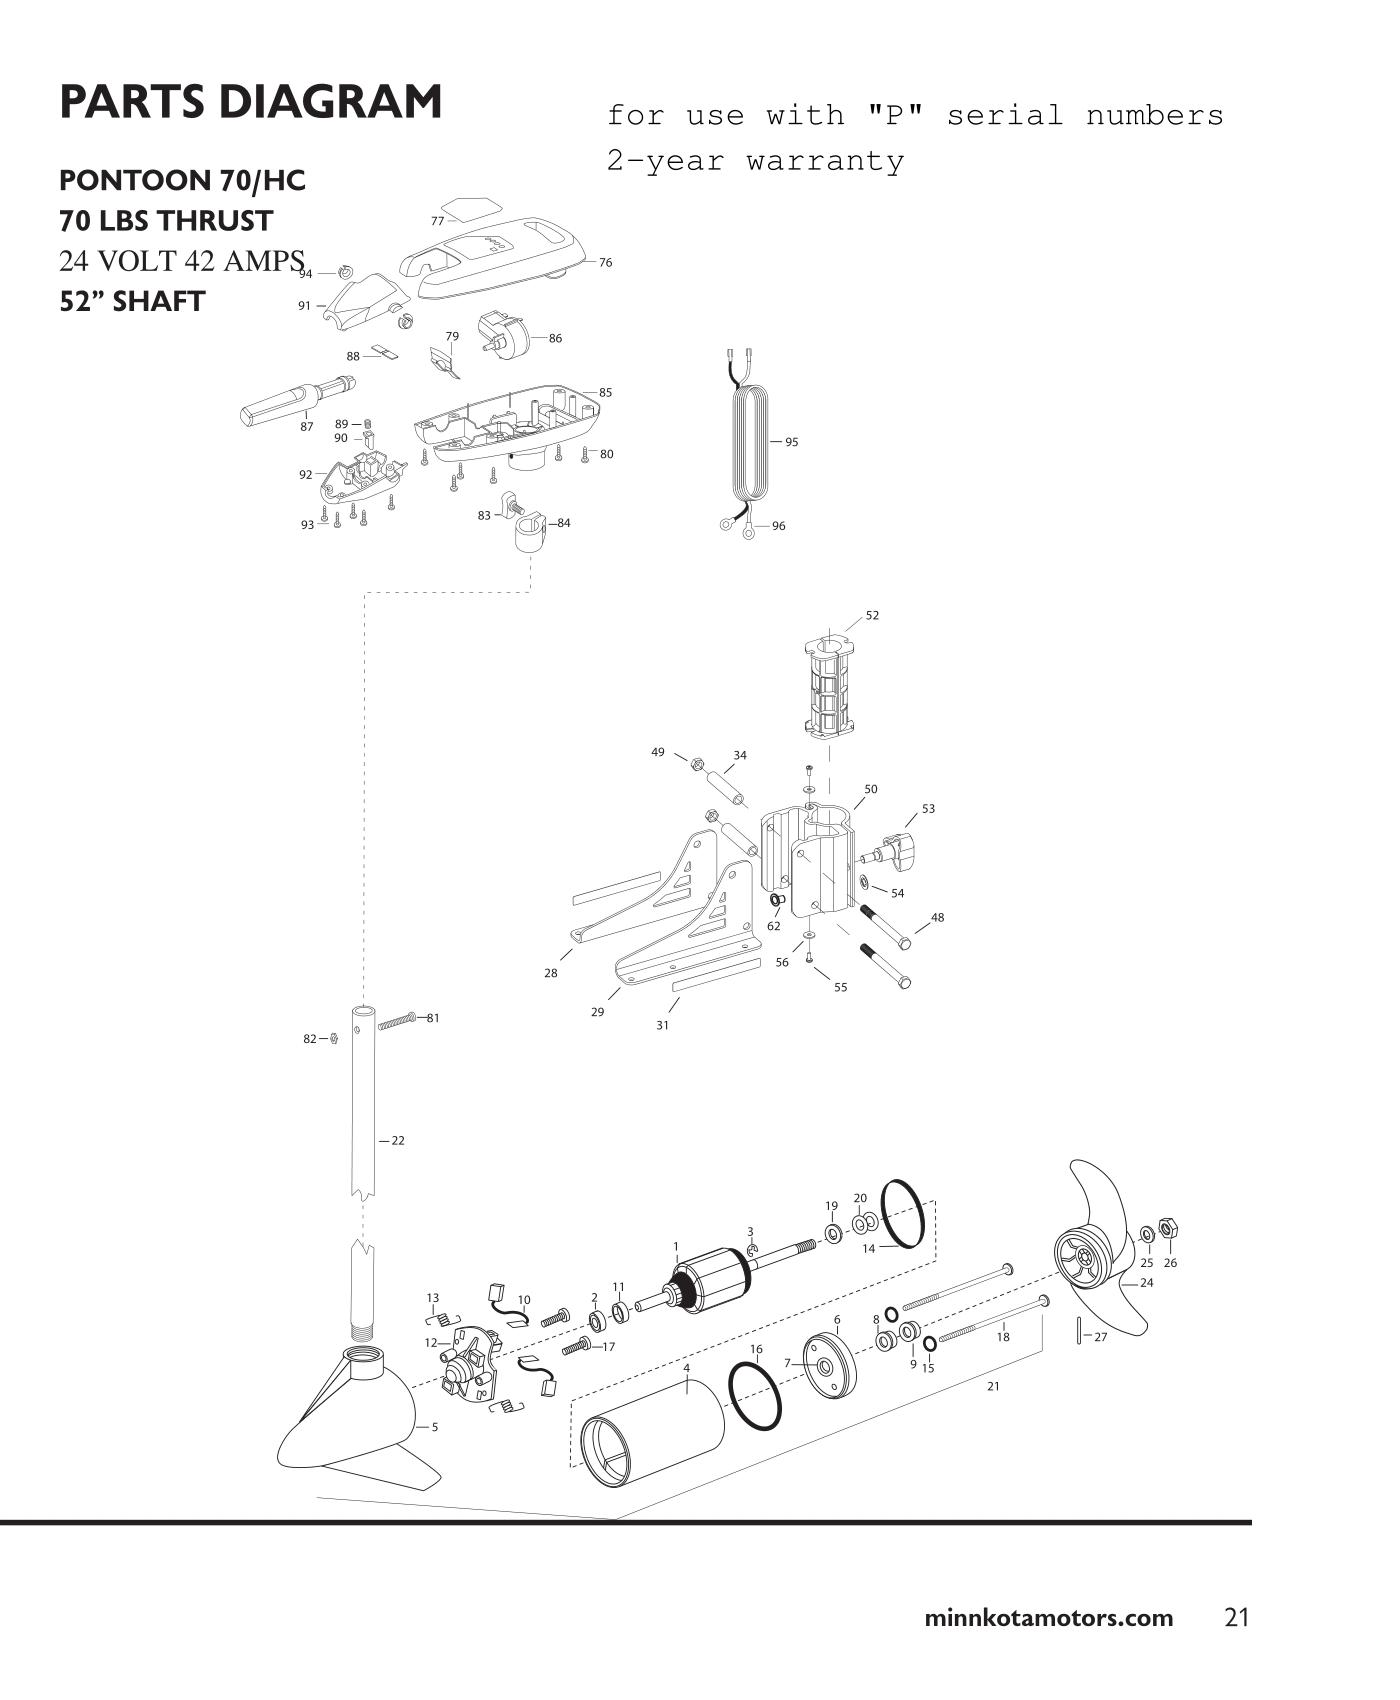 2015-mk-pontoon70handcontrol-1.png